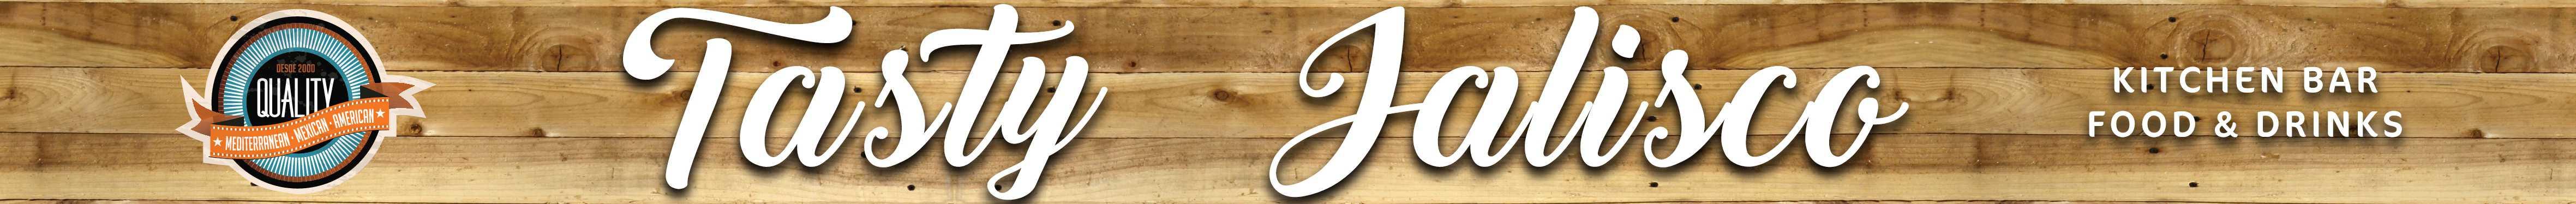 Resturante-Mexicano-Tasty_Jalisco-Logo-original.jpg